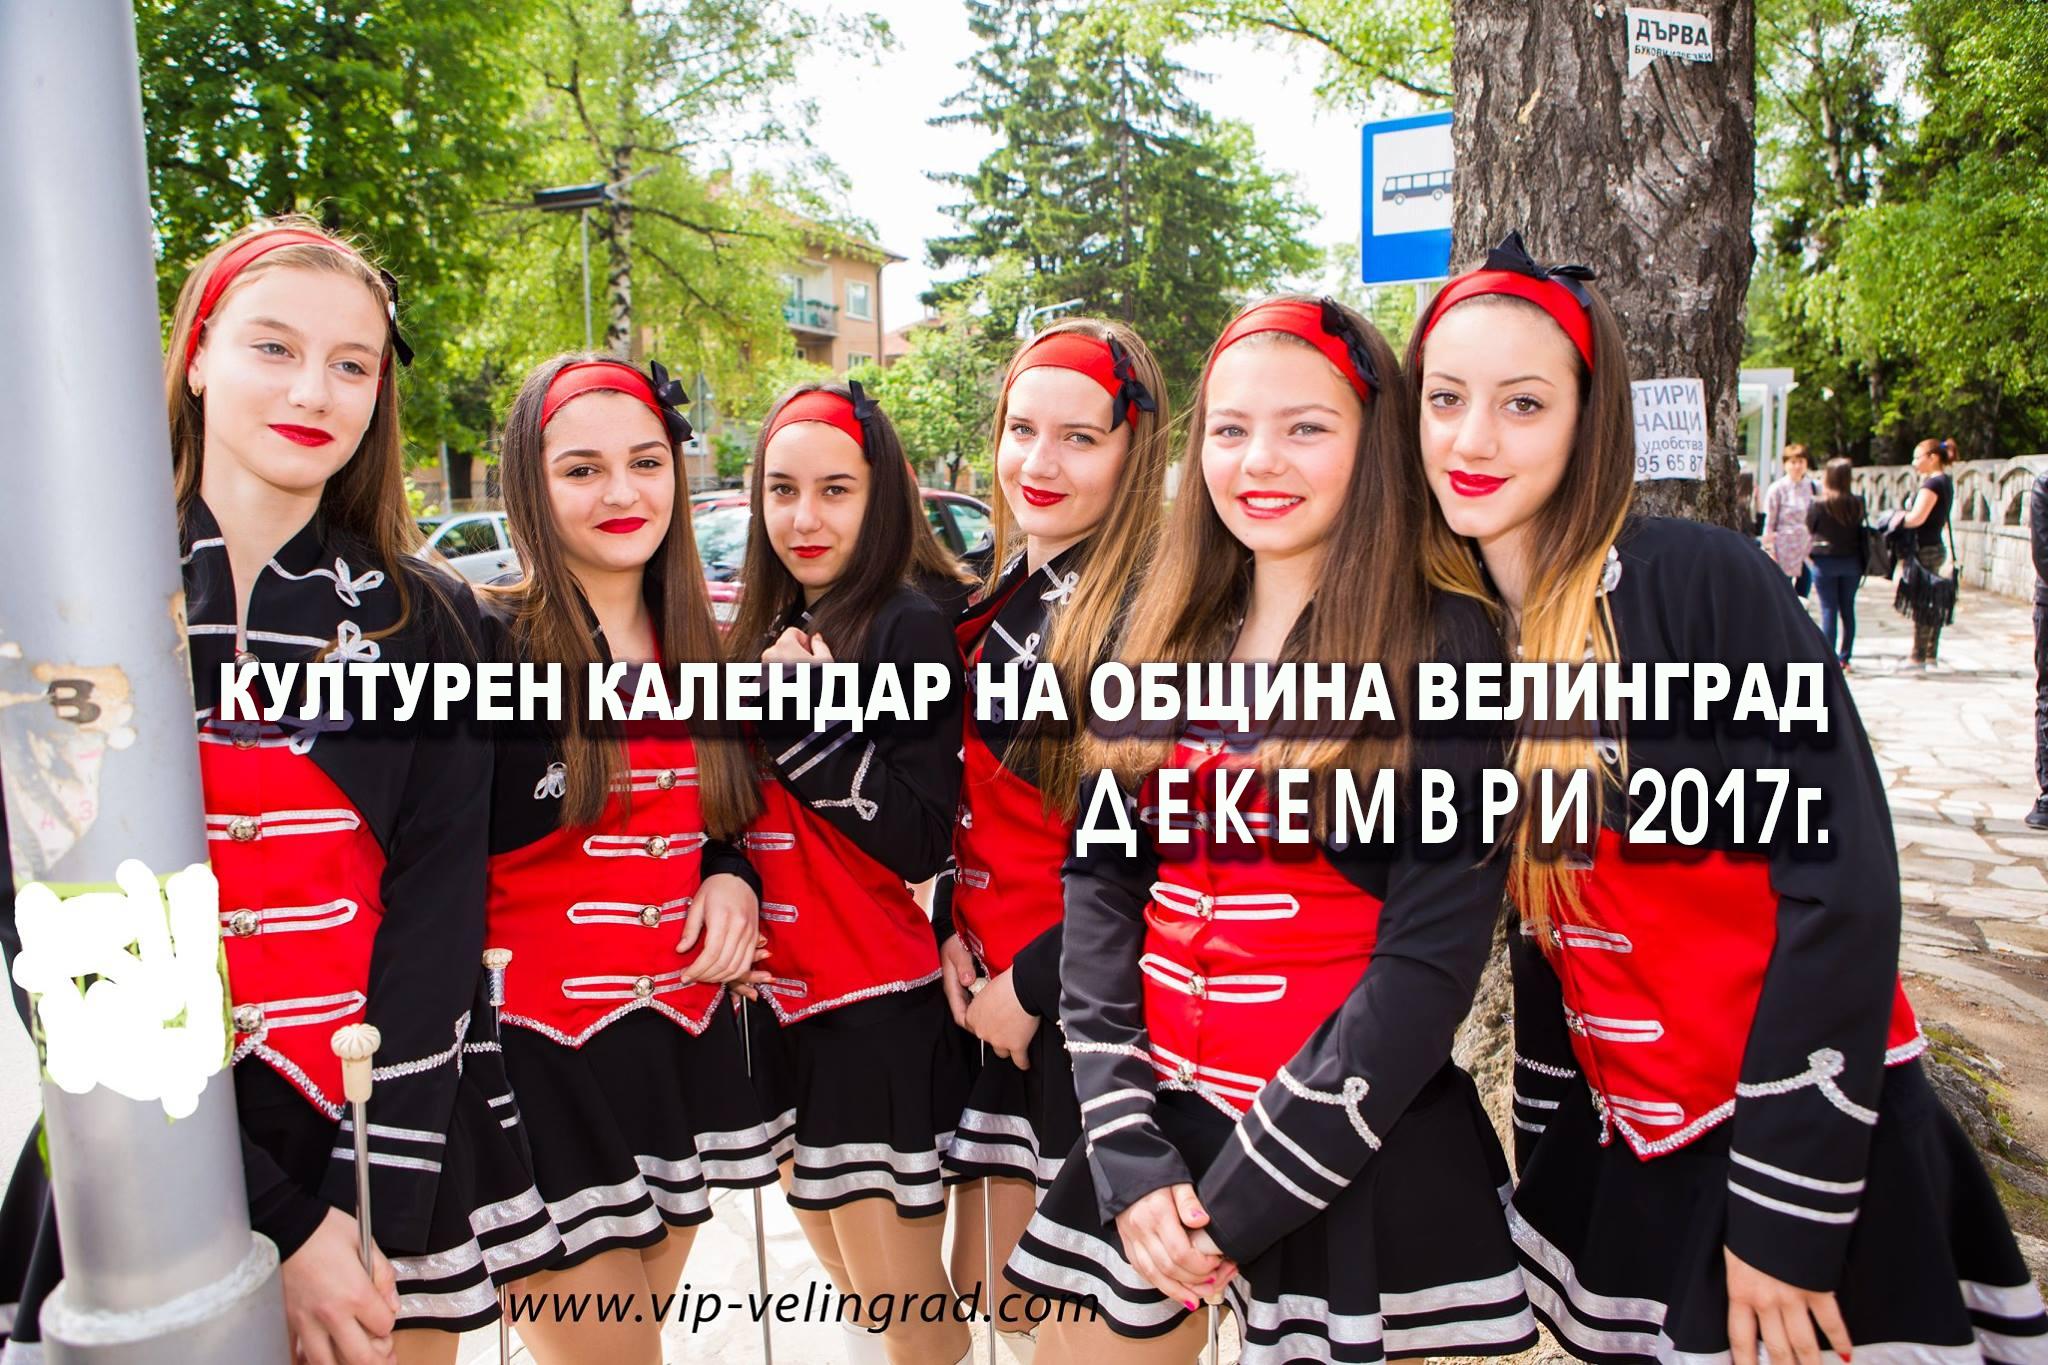 КУЛТУРЕН КАЛЕНДАР НА ОБЩИНА ВЕЛИНГРАД ДЕКЕМВРИ  2017г.